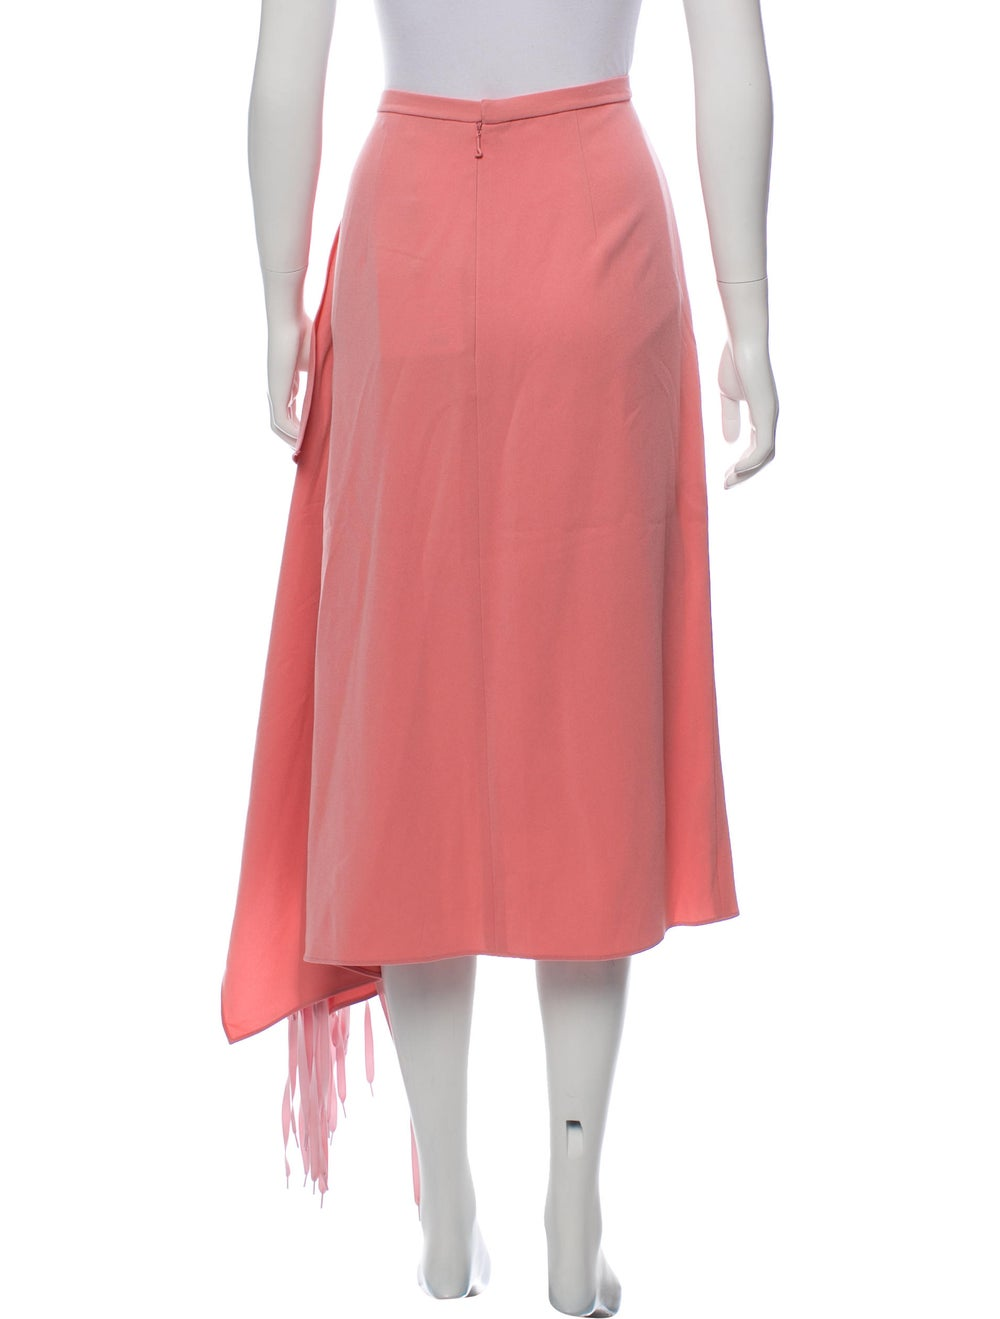 Tibi 2018 Fringe Skirt Pink - image 3